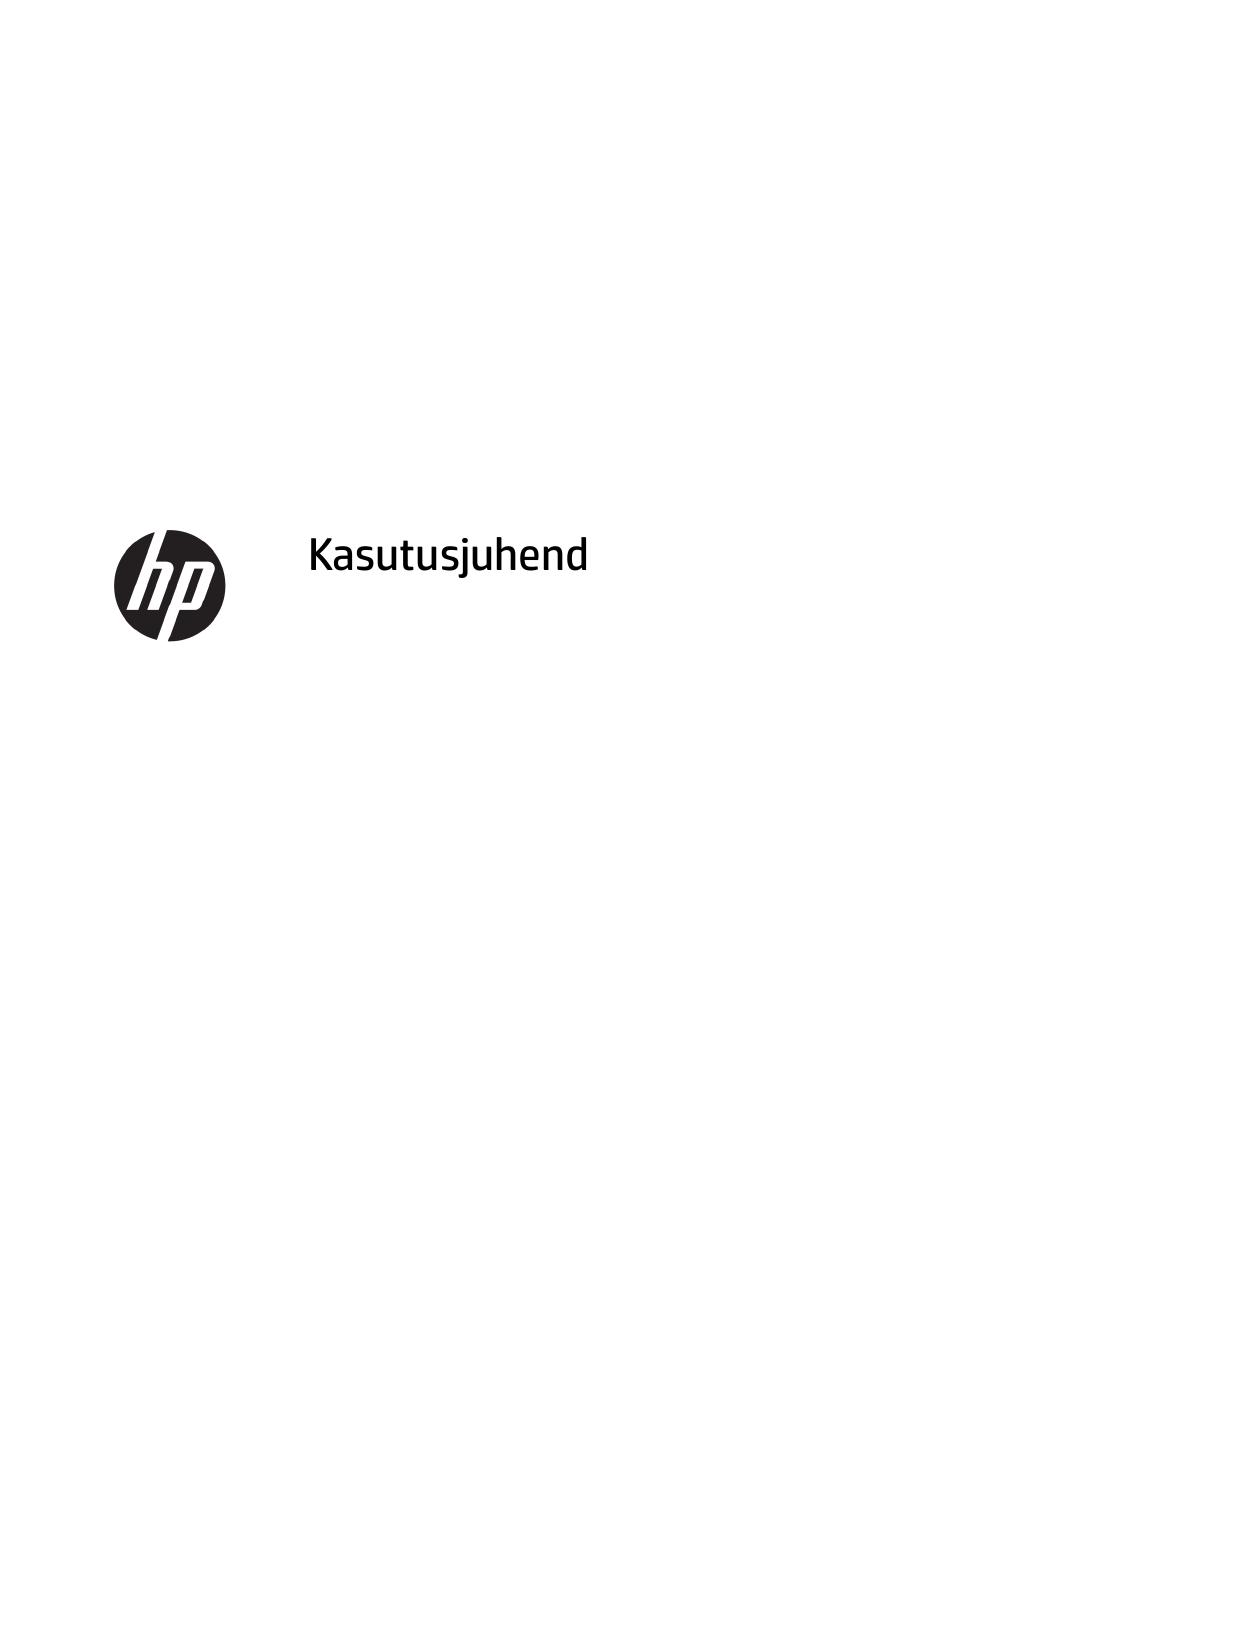 e8f0c4581db HP ZBook 15v G5 Mobile Workstation Kasutusjuhend | manualzz.com